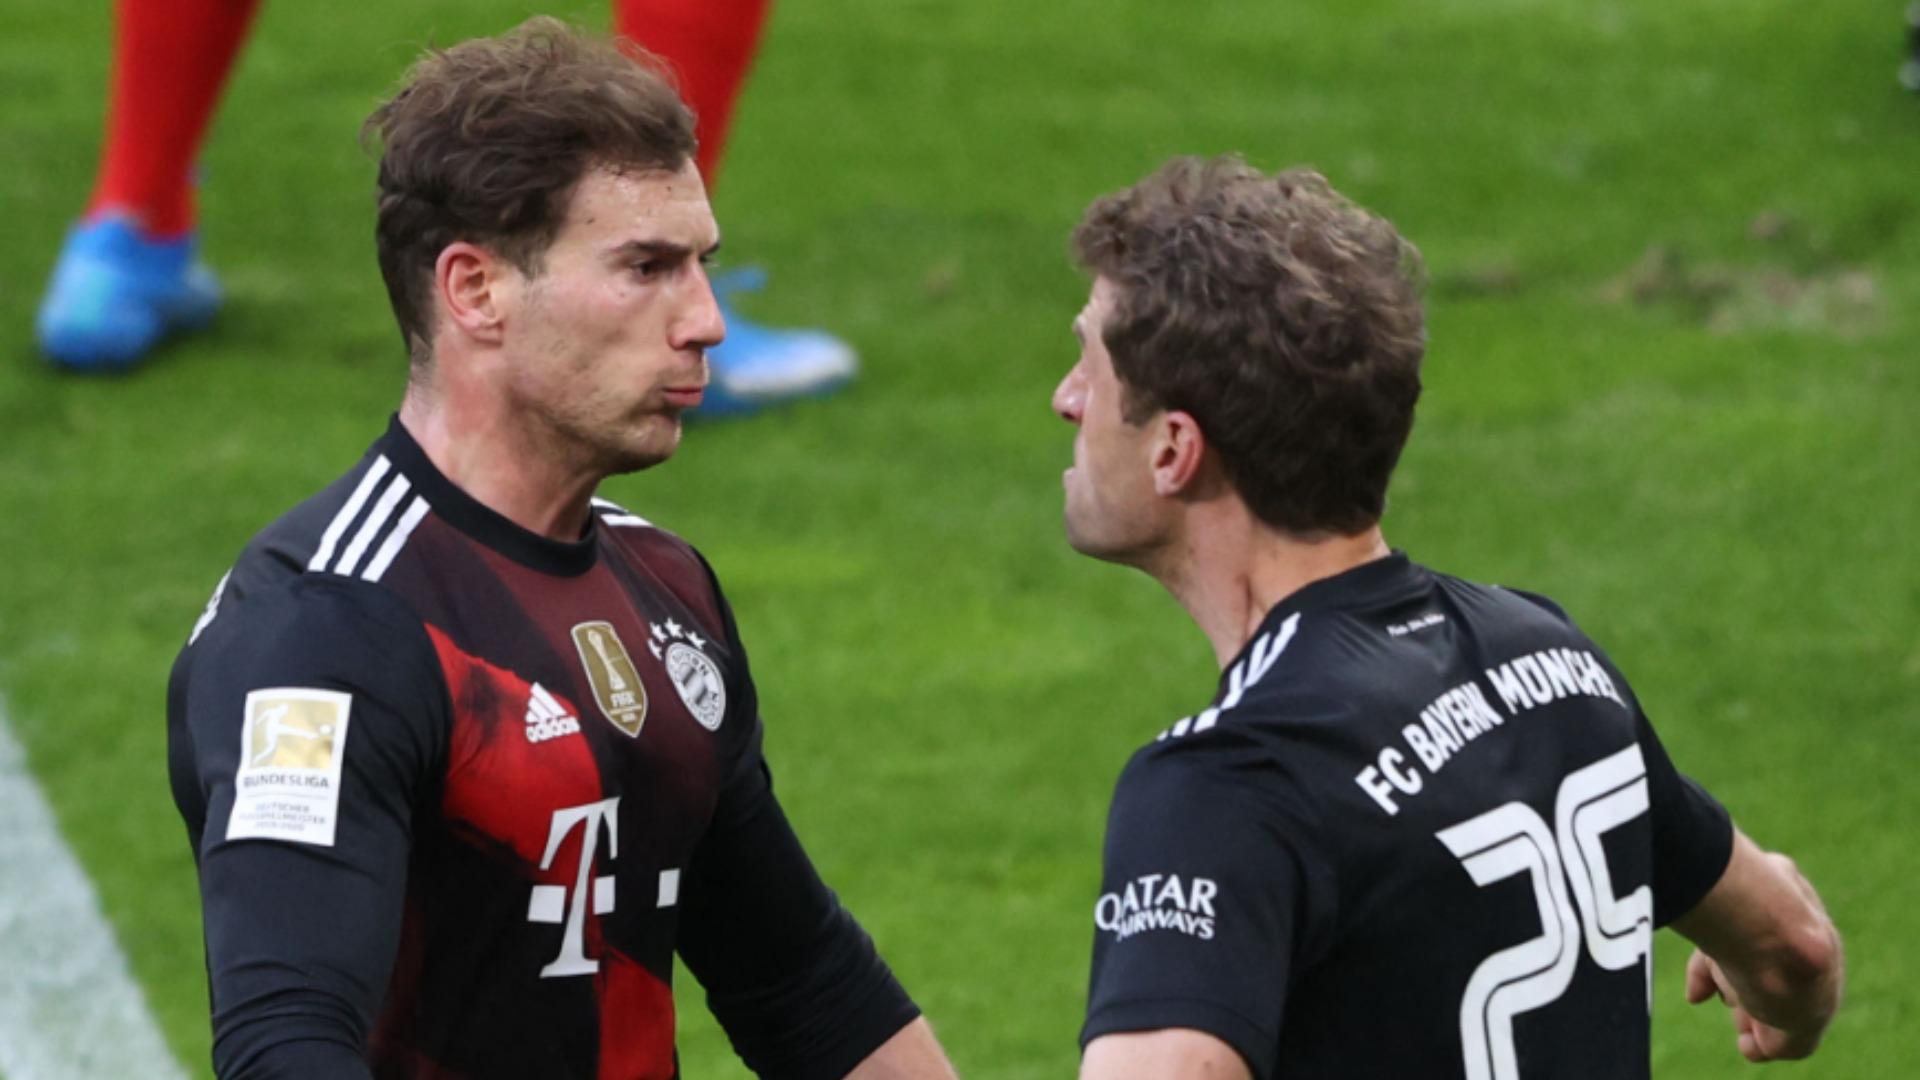 RB Leipzig 0-1 Bayern Munich: Goretzka moves Flick's men seven points clear